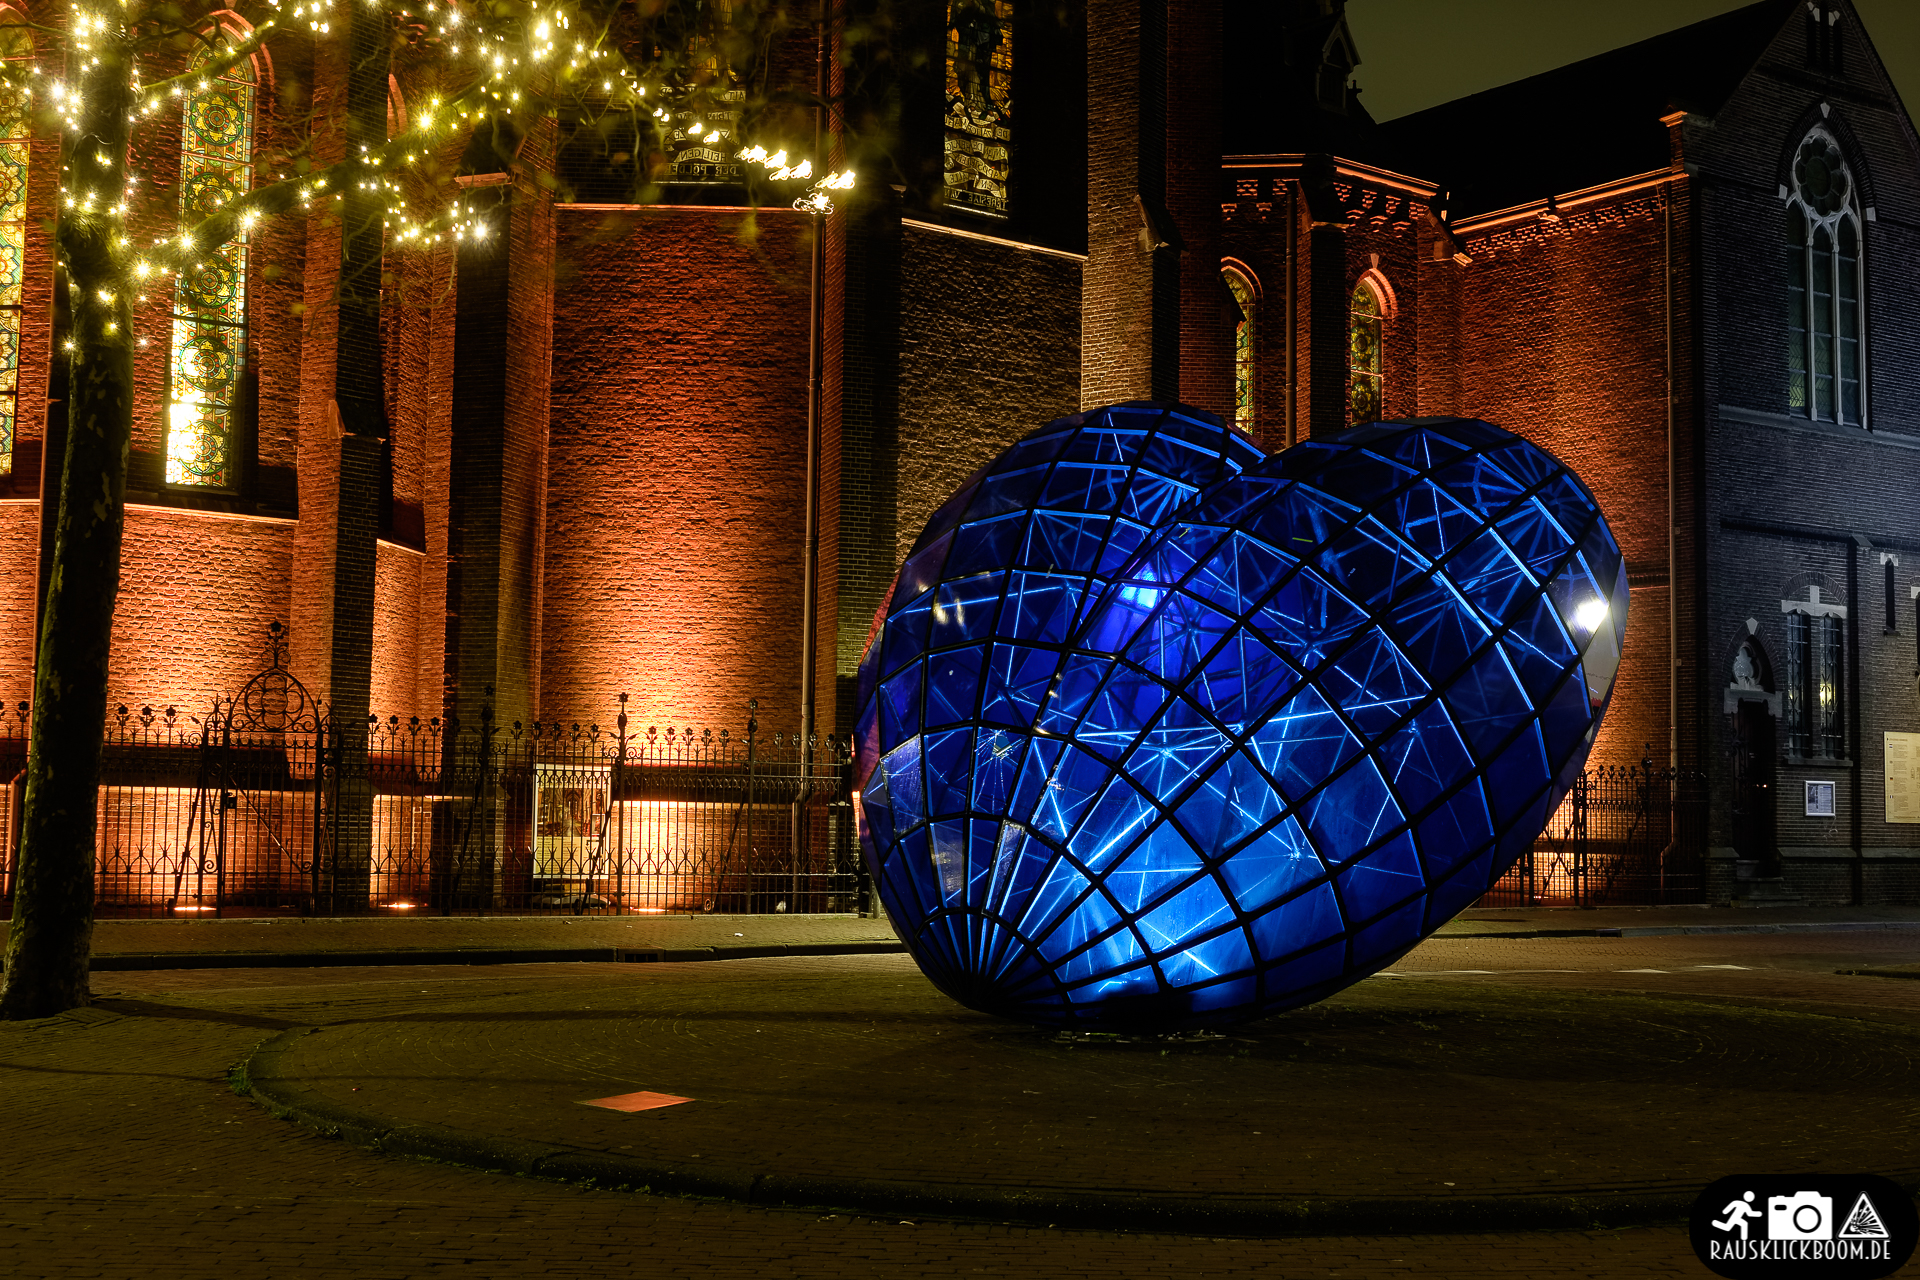 Niederlande-Delft-3